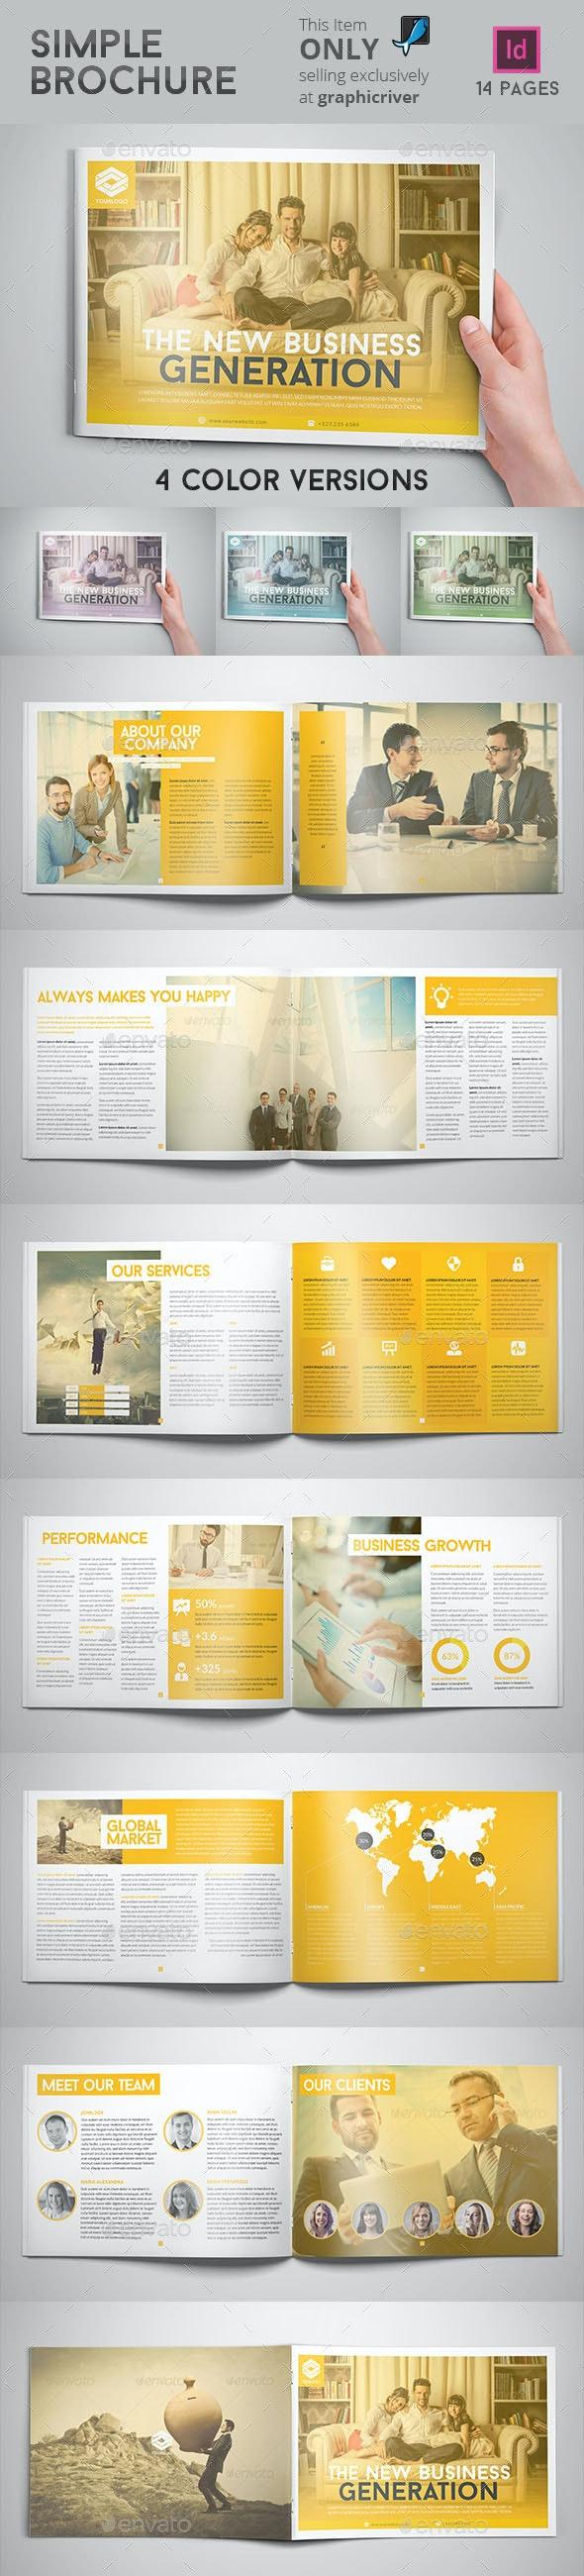 Simple Brochure - Corporate Brochures